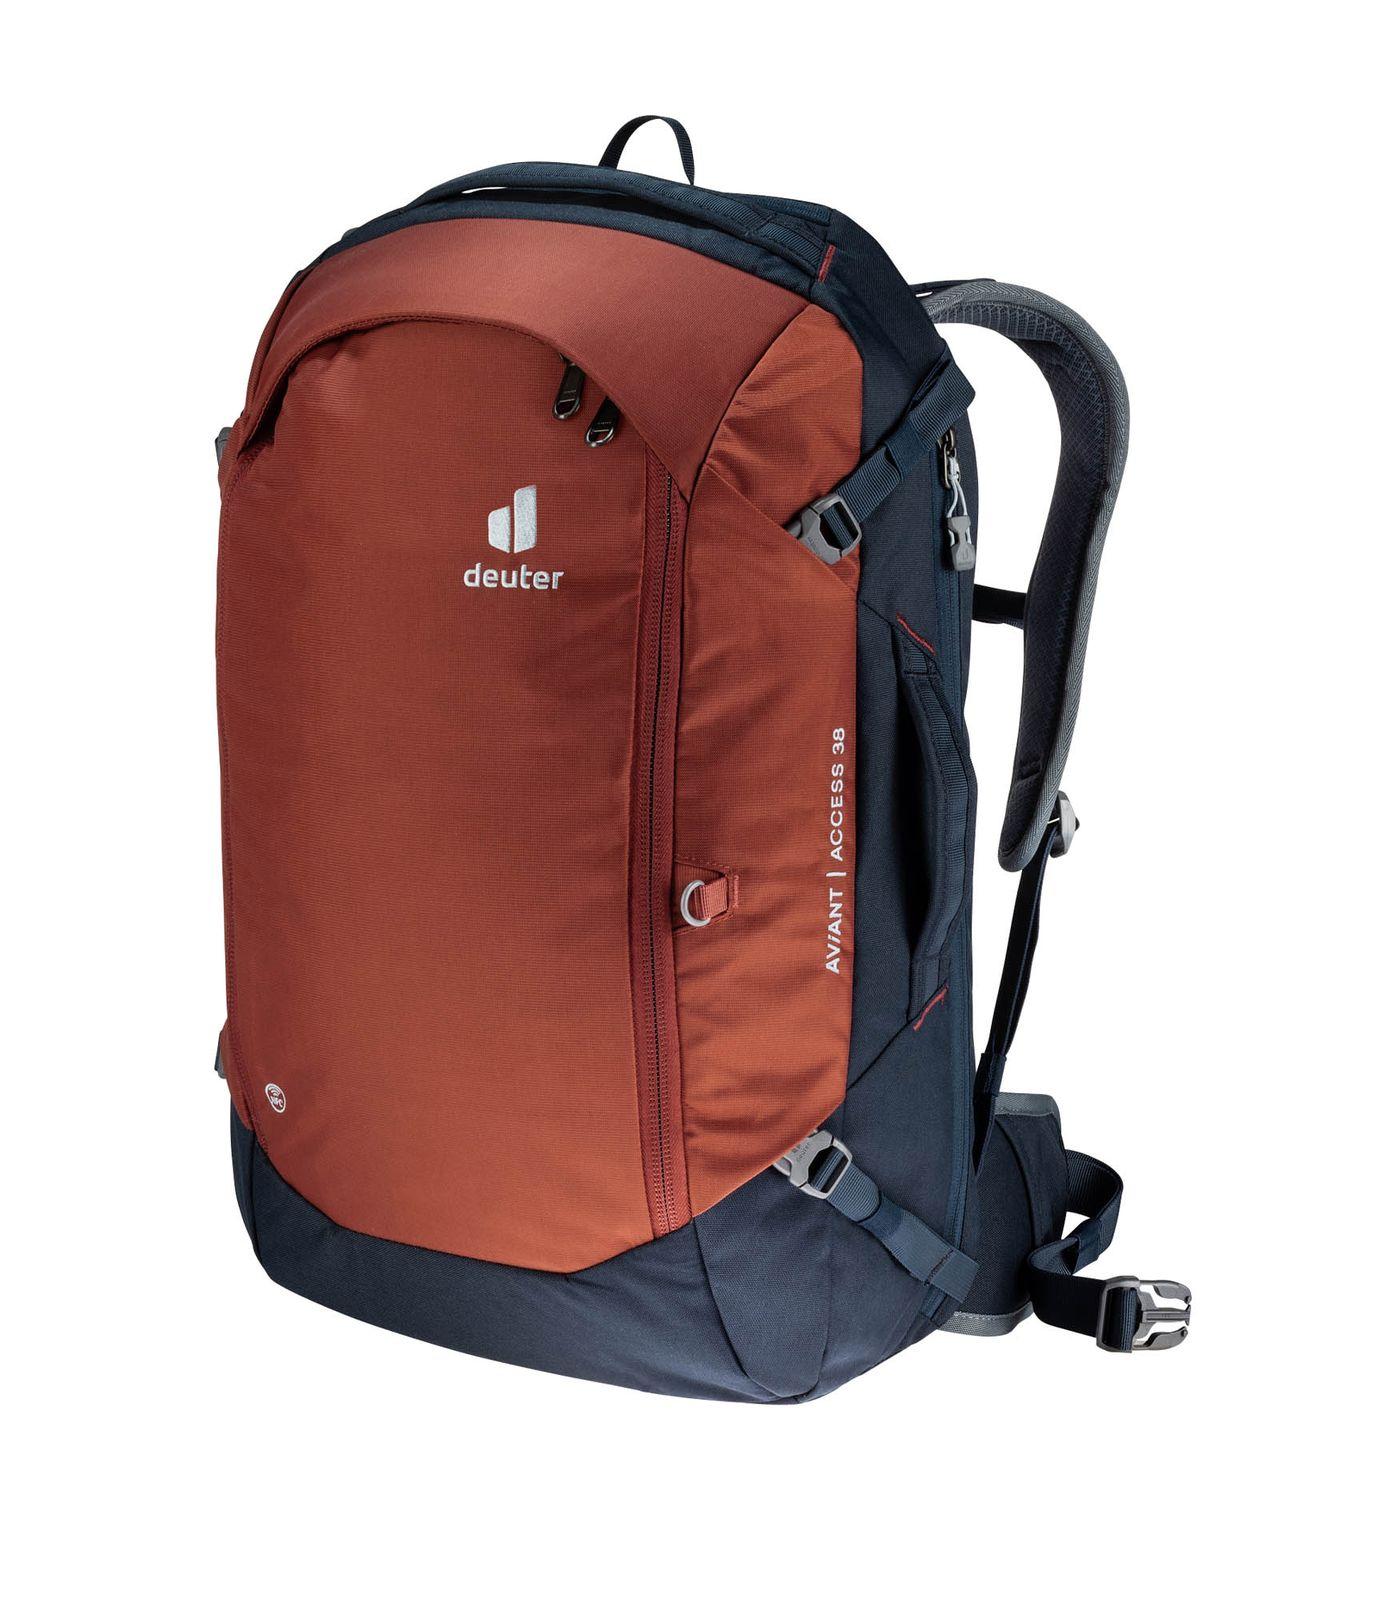 deuter Aviant Access 38 Backpack Redwood - Ink